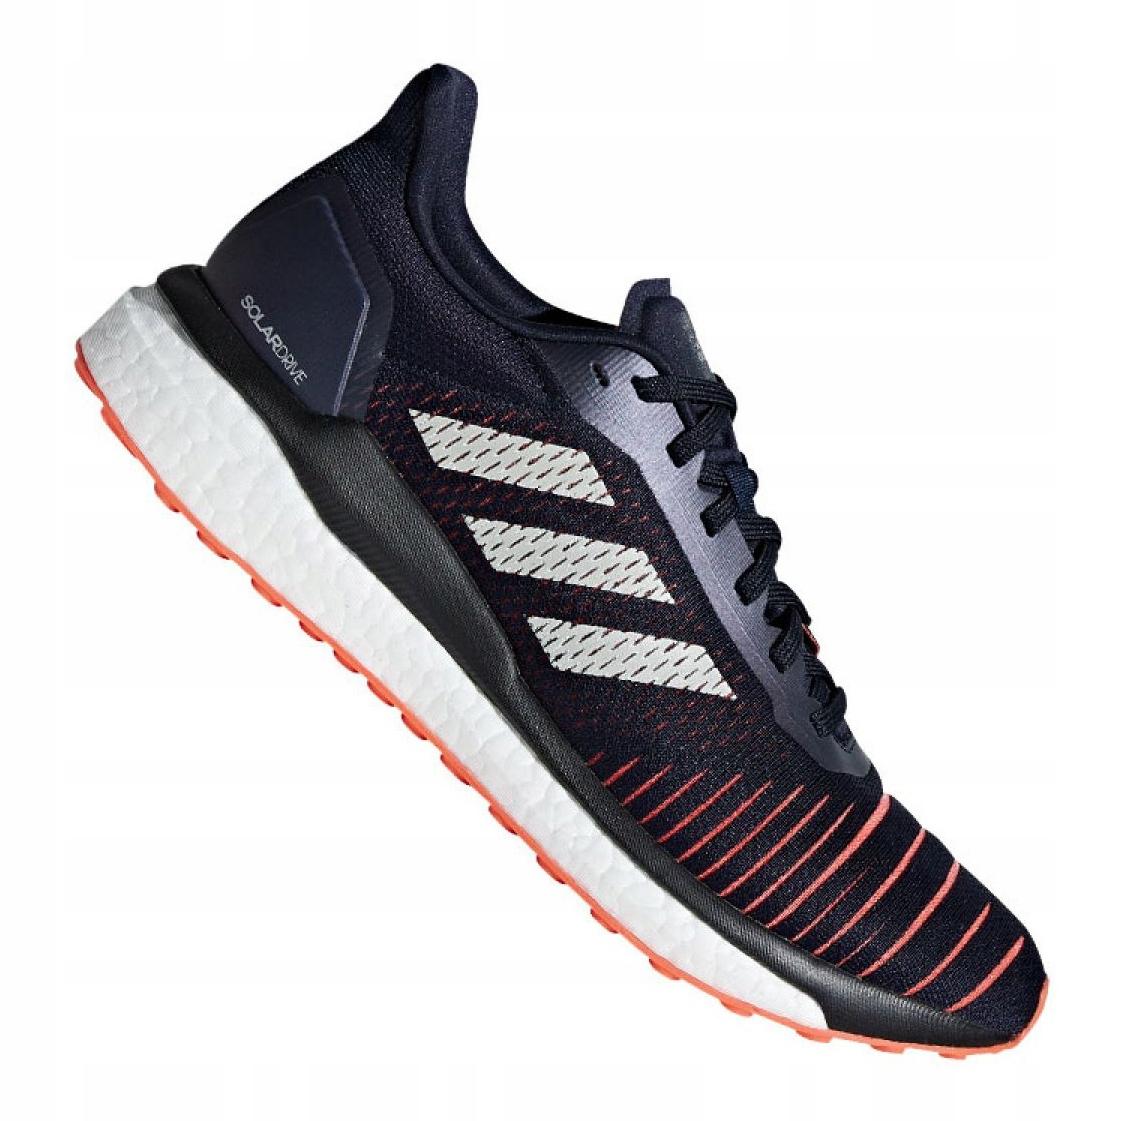 Adidas SportSchuhe LaufSchuhe Sneakers Running Shoes Boost Solar Drive Blau